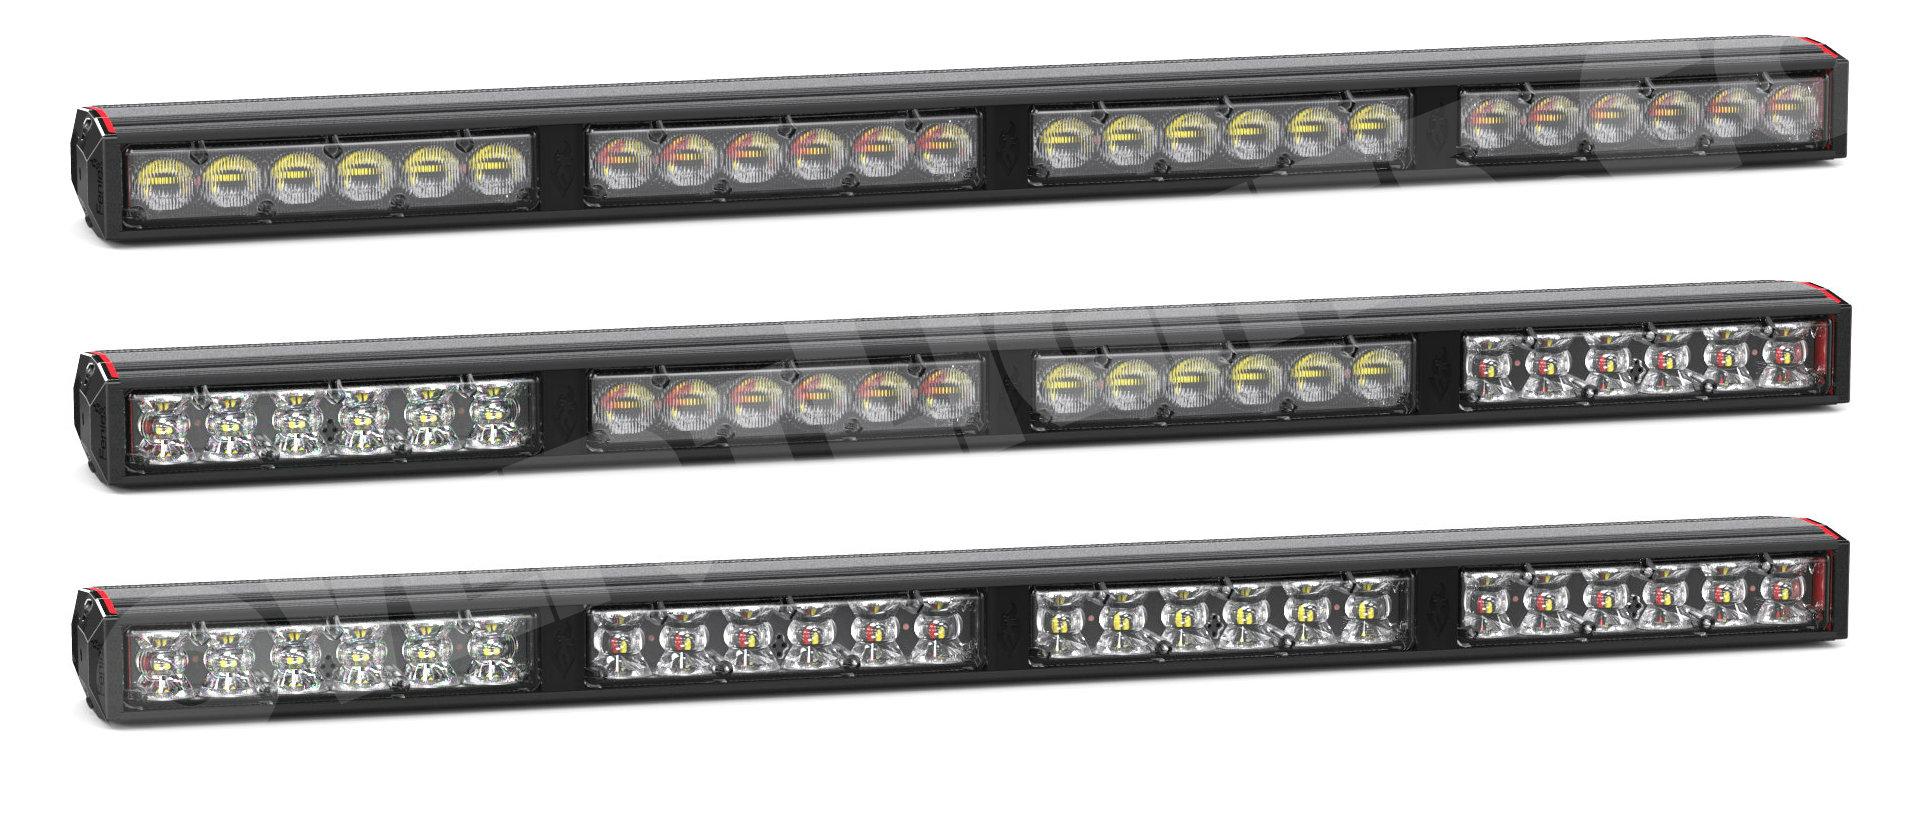 feniex-fusion-400-lightstick-covertlights.jpg